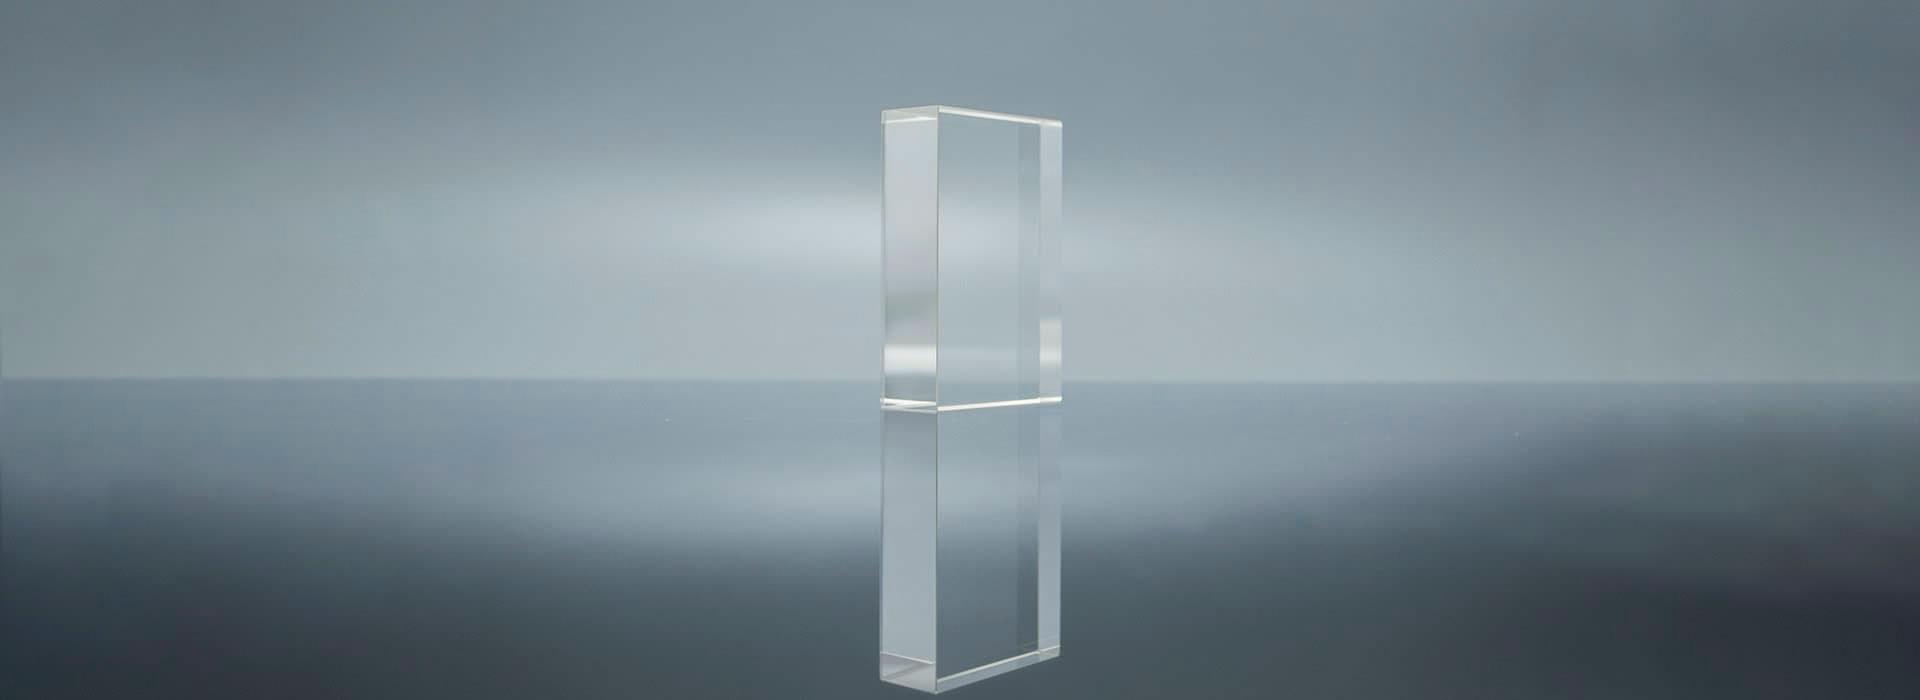 TeO2-二氧化碲声光晶体-南京光宝-CRYLINK